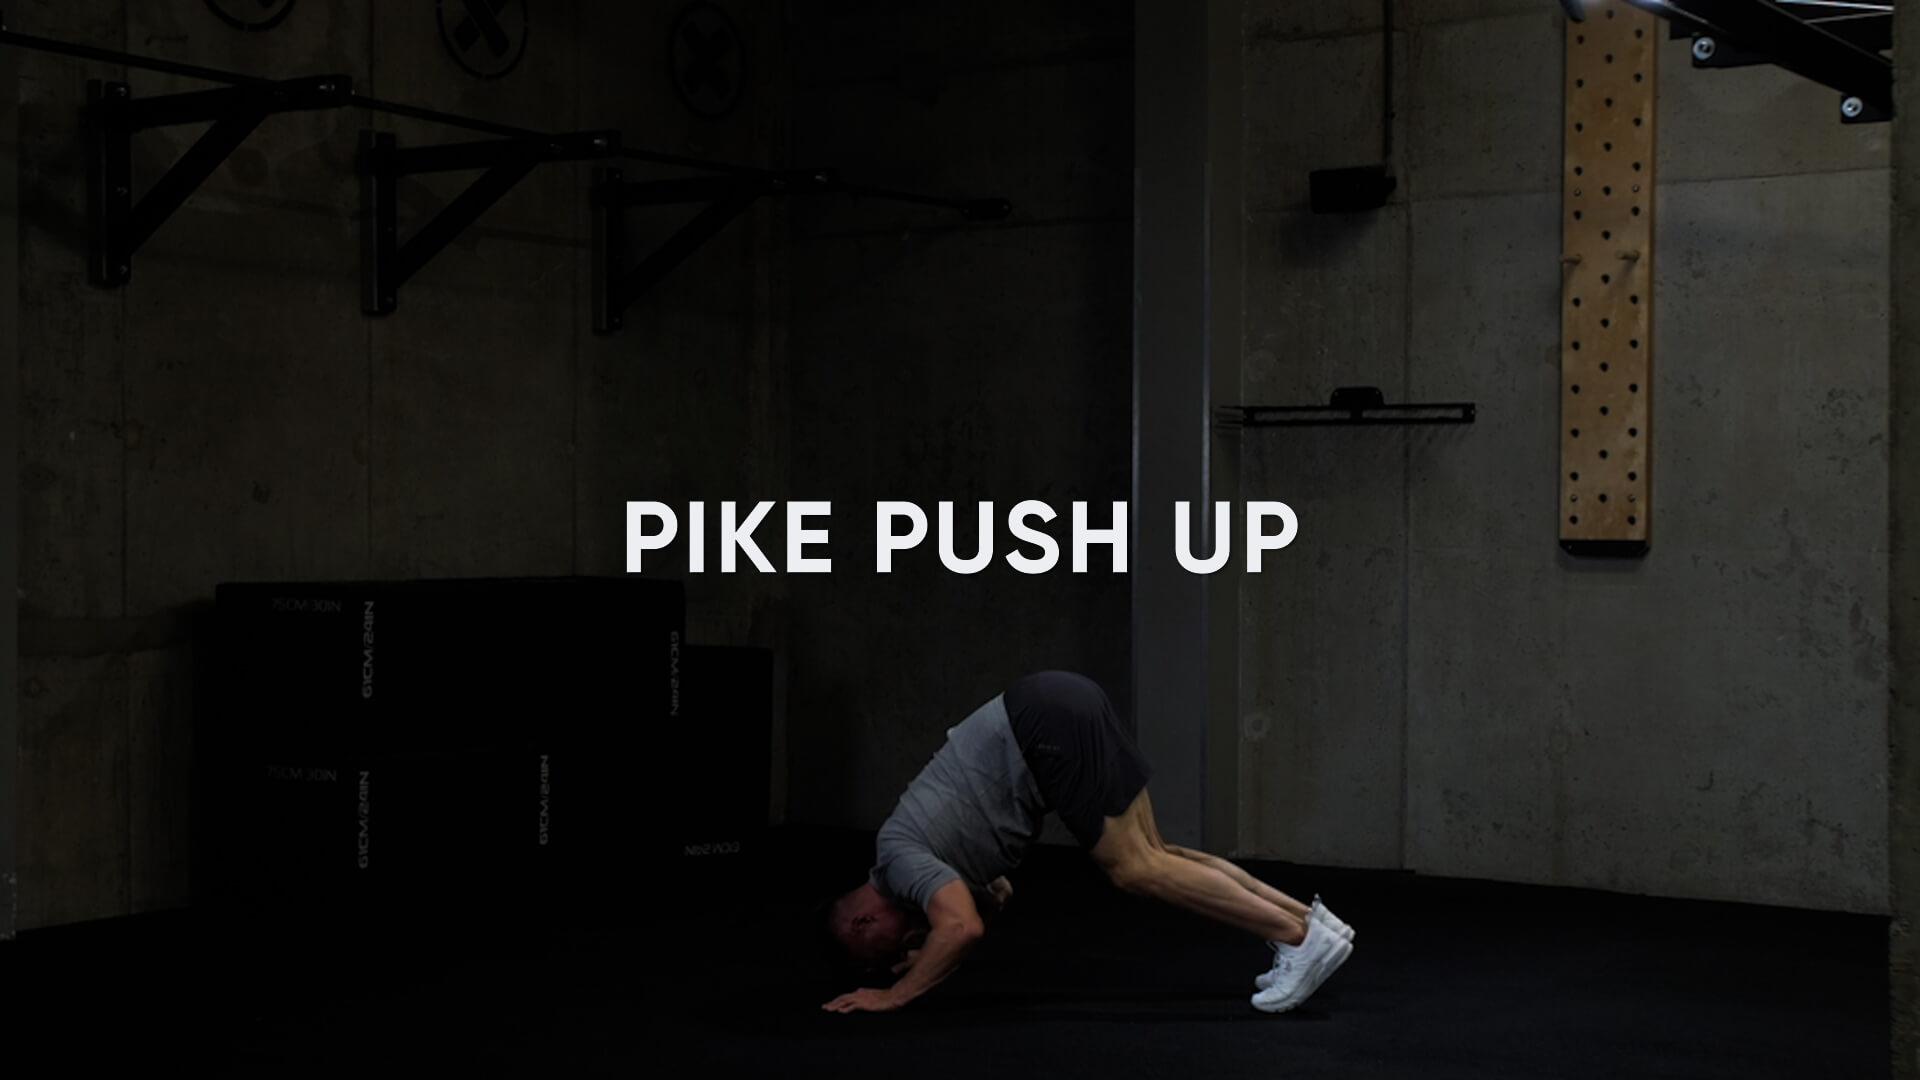 Pike Push Up